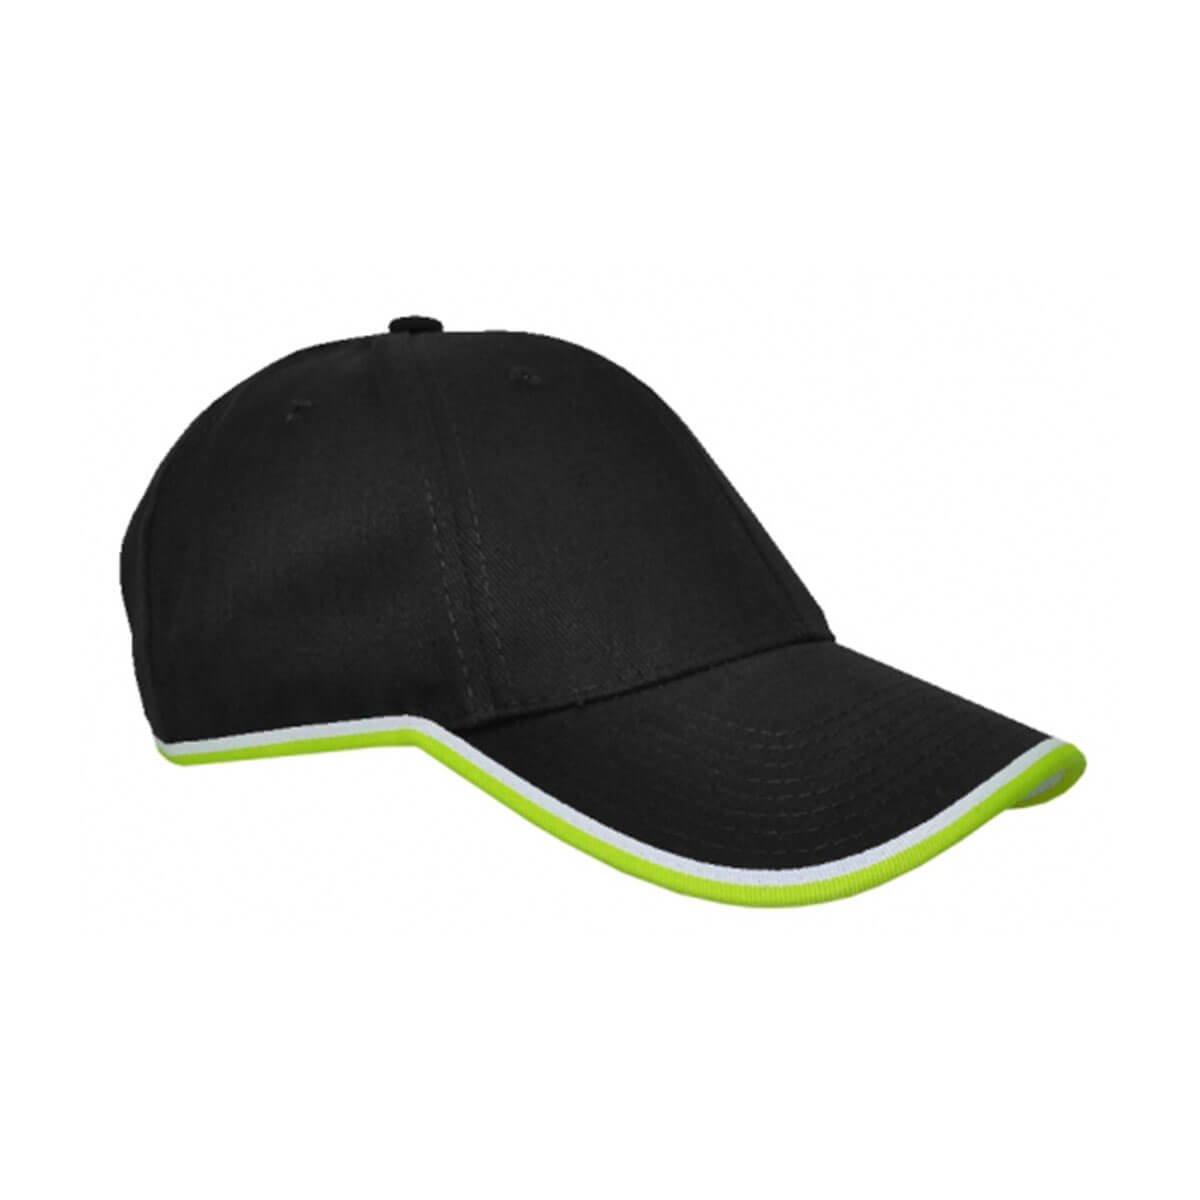 Michigan Cap-Black / White / Lime